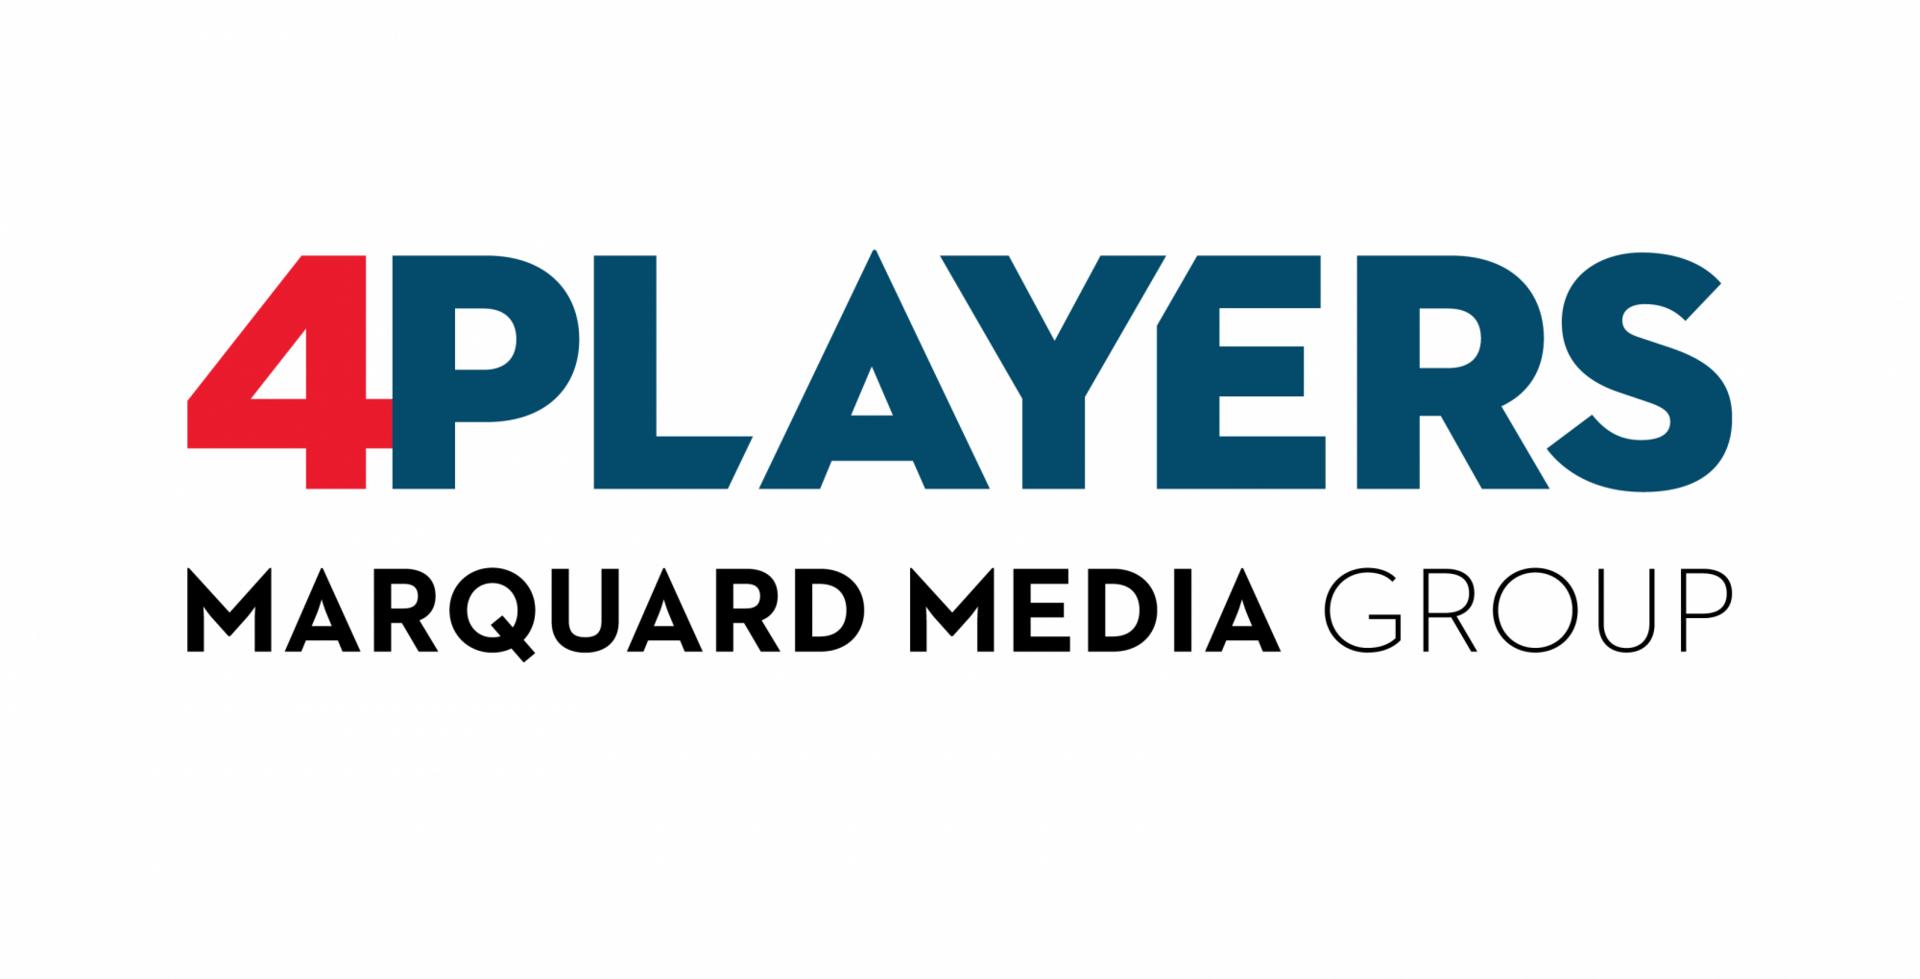 4Players es parte de Marquard Media Group